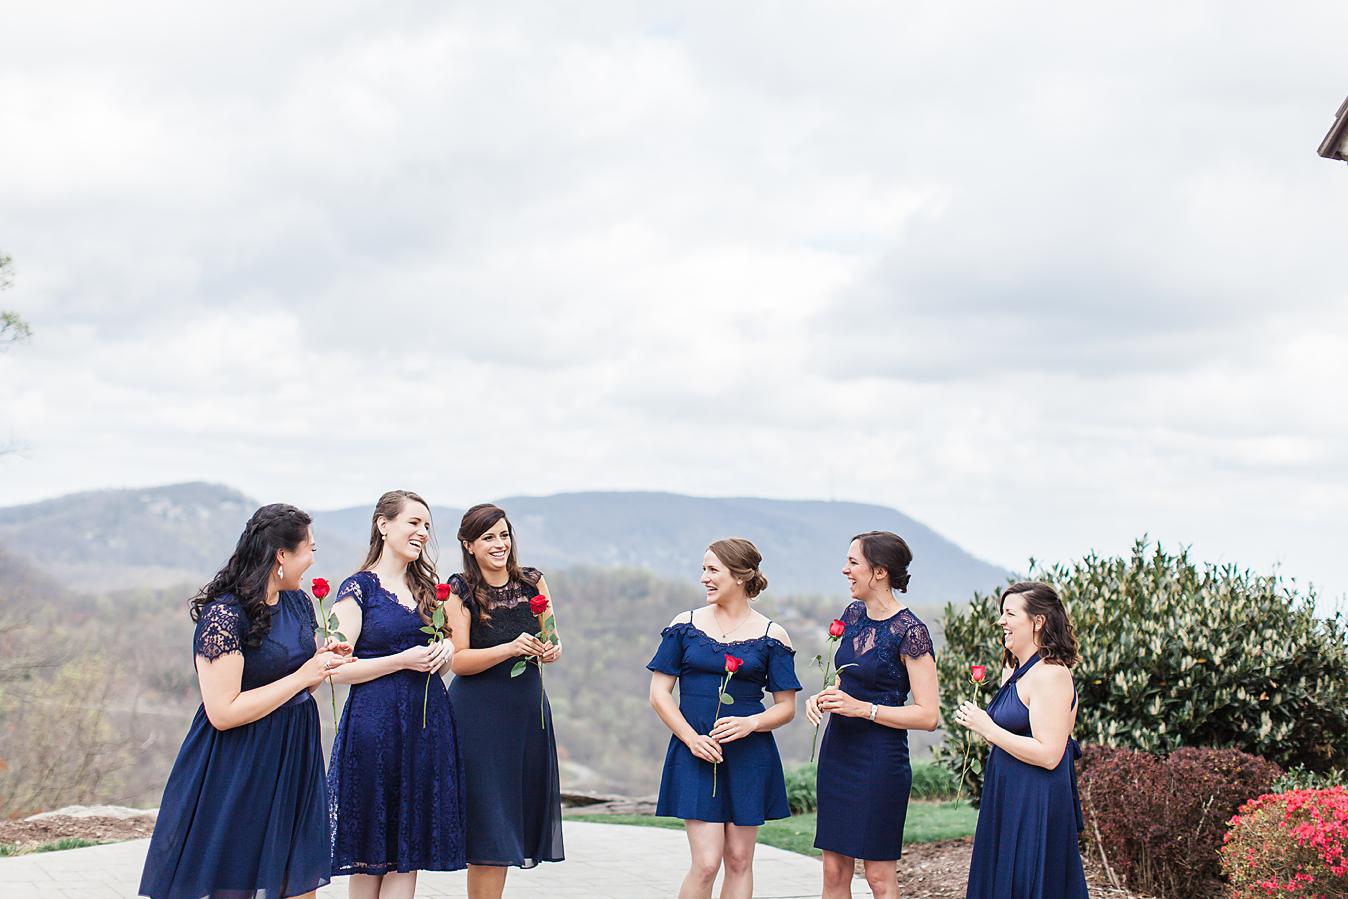 Dallas Wedding Photographer Glassy Mountain Chapel Greenville South Carolina scottish wedding bridesmaids outside kate marie portraiture.png